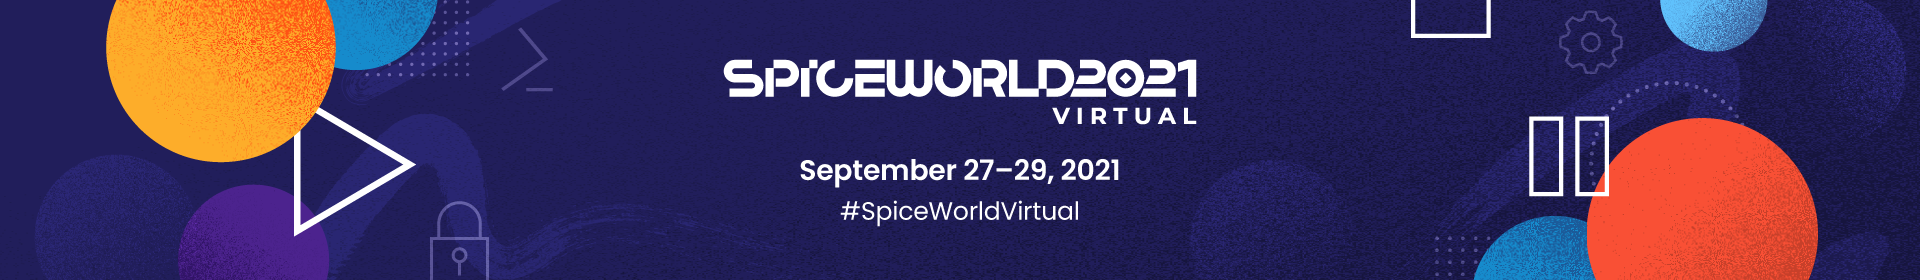 SpiceWorld Virtual 2021 Event Banner